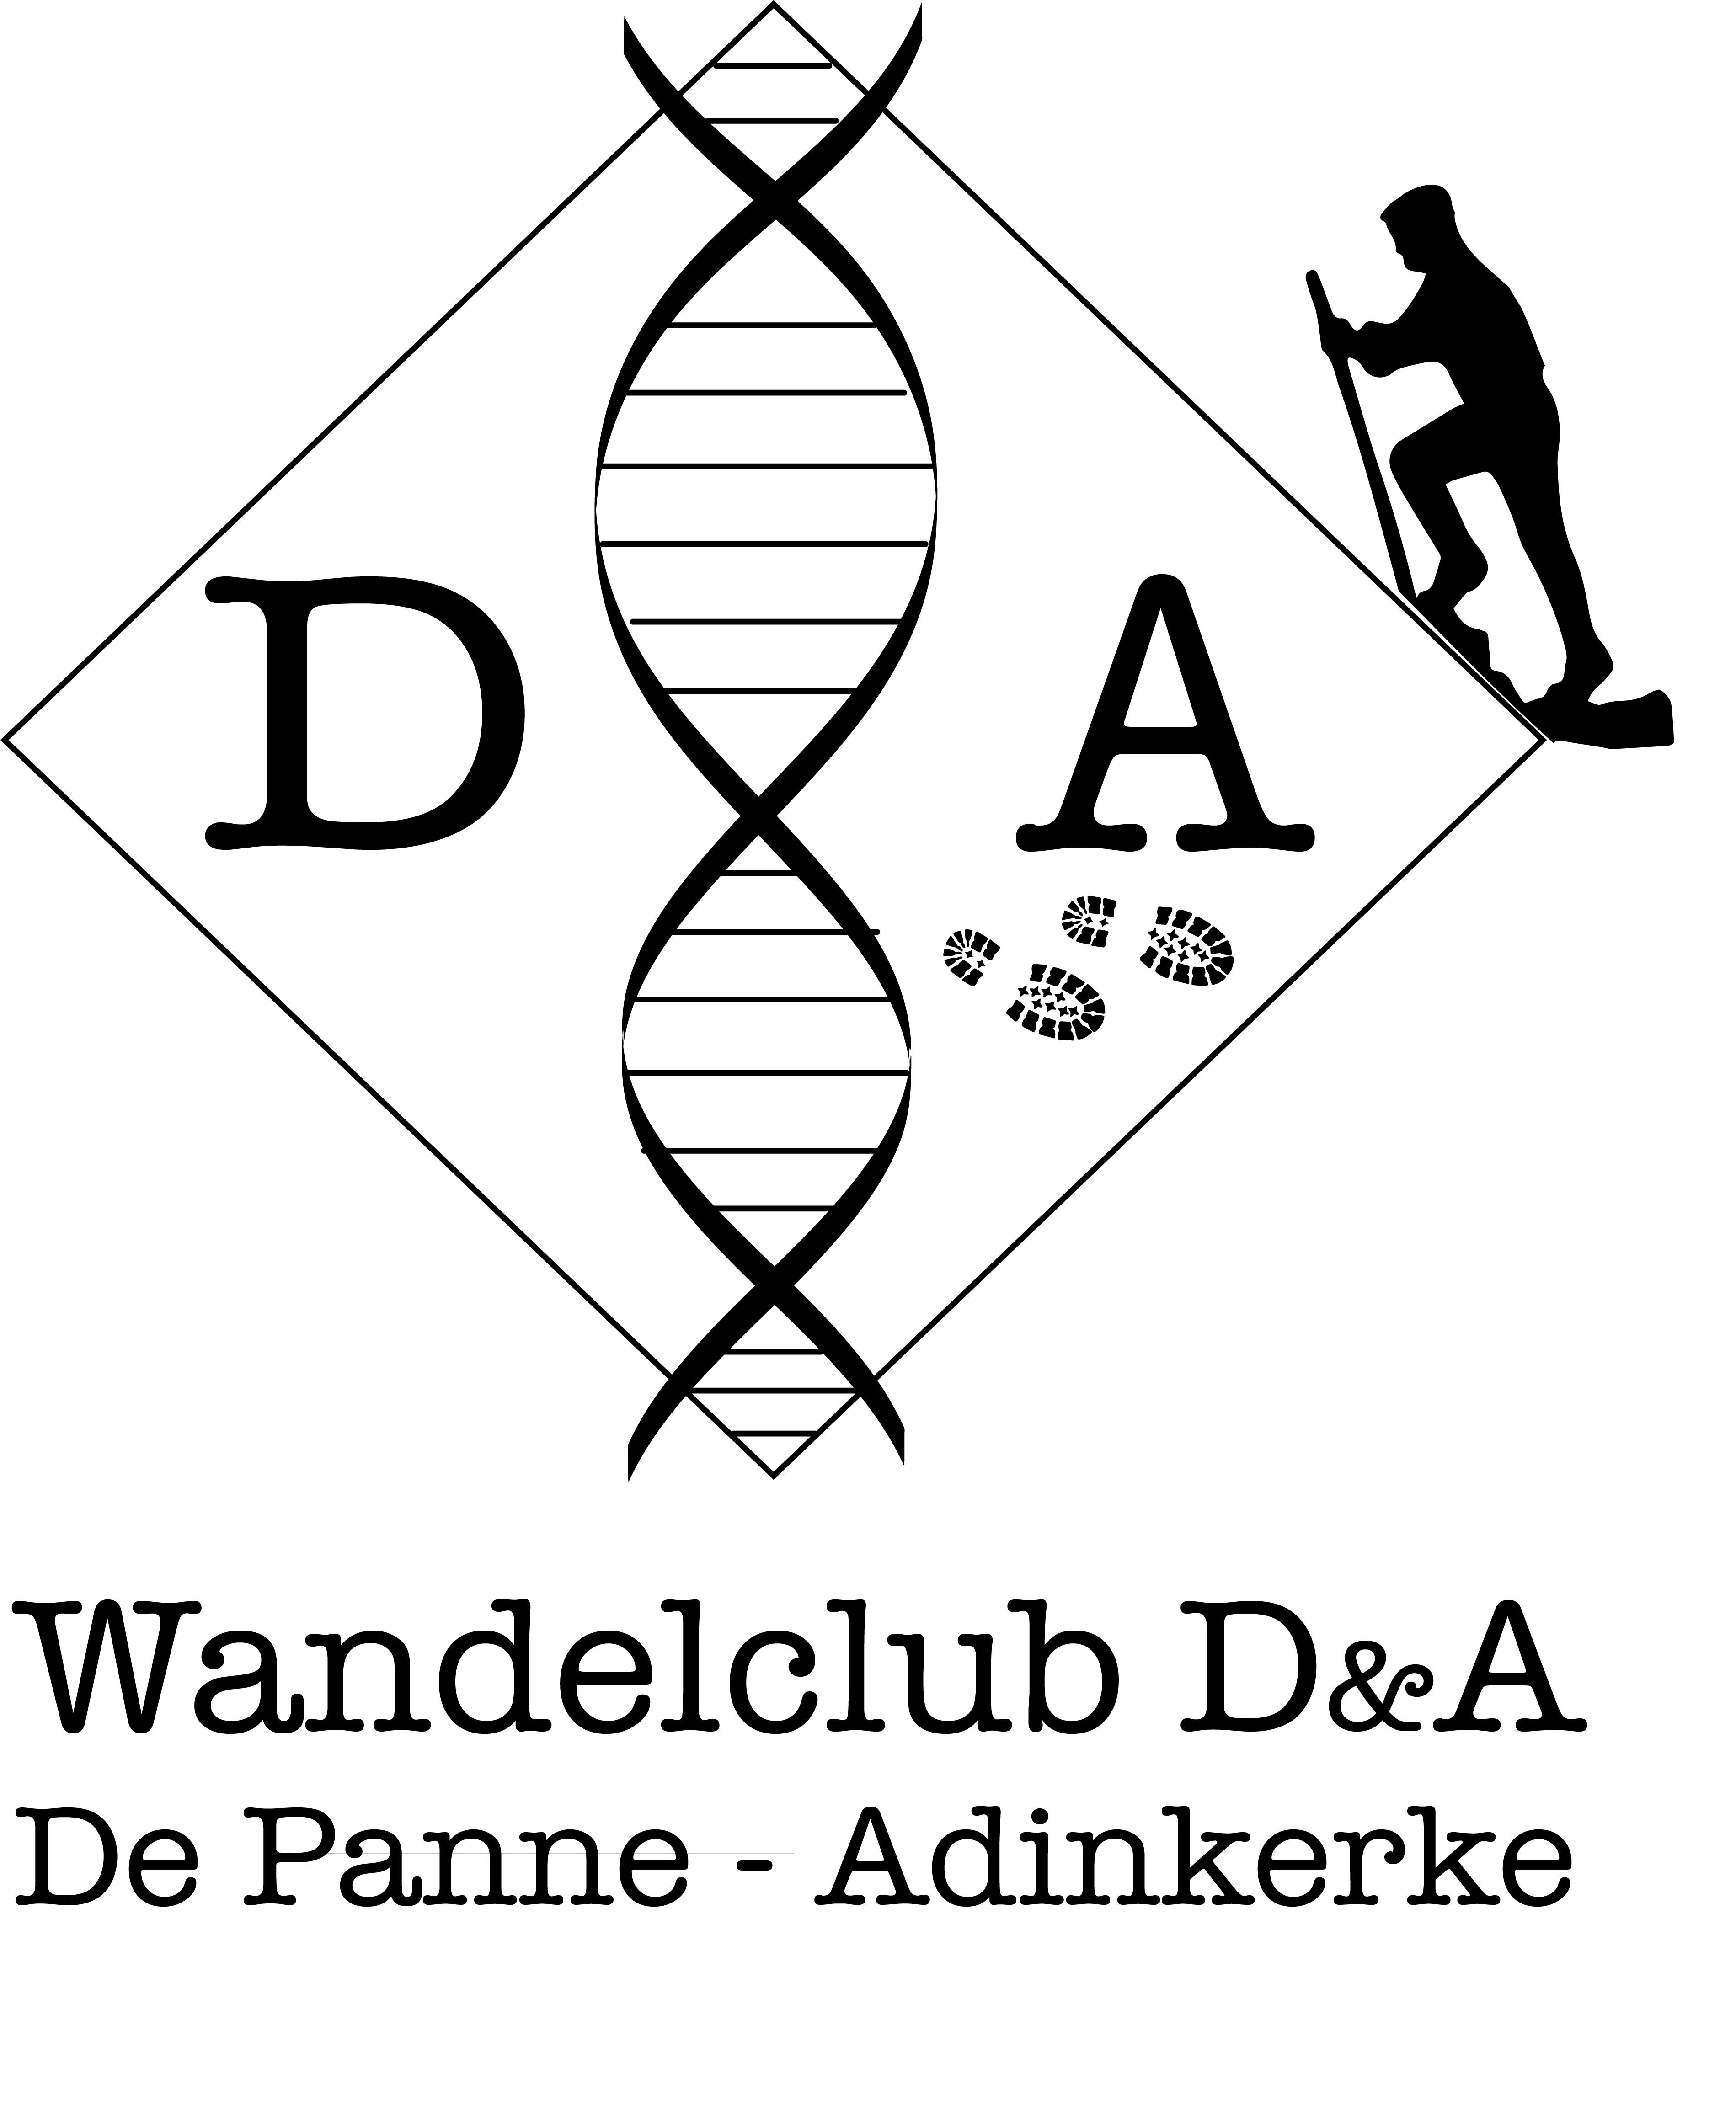 Wandelclub D&A